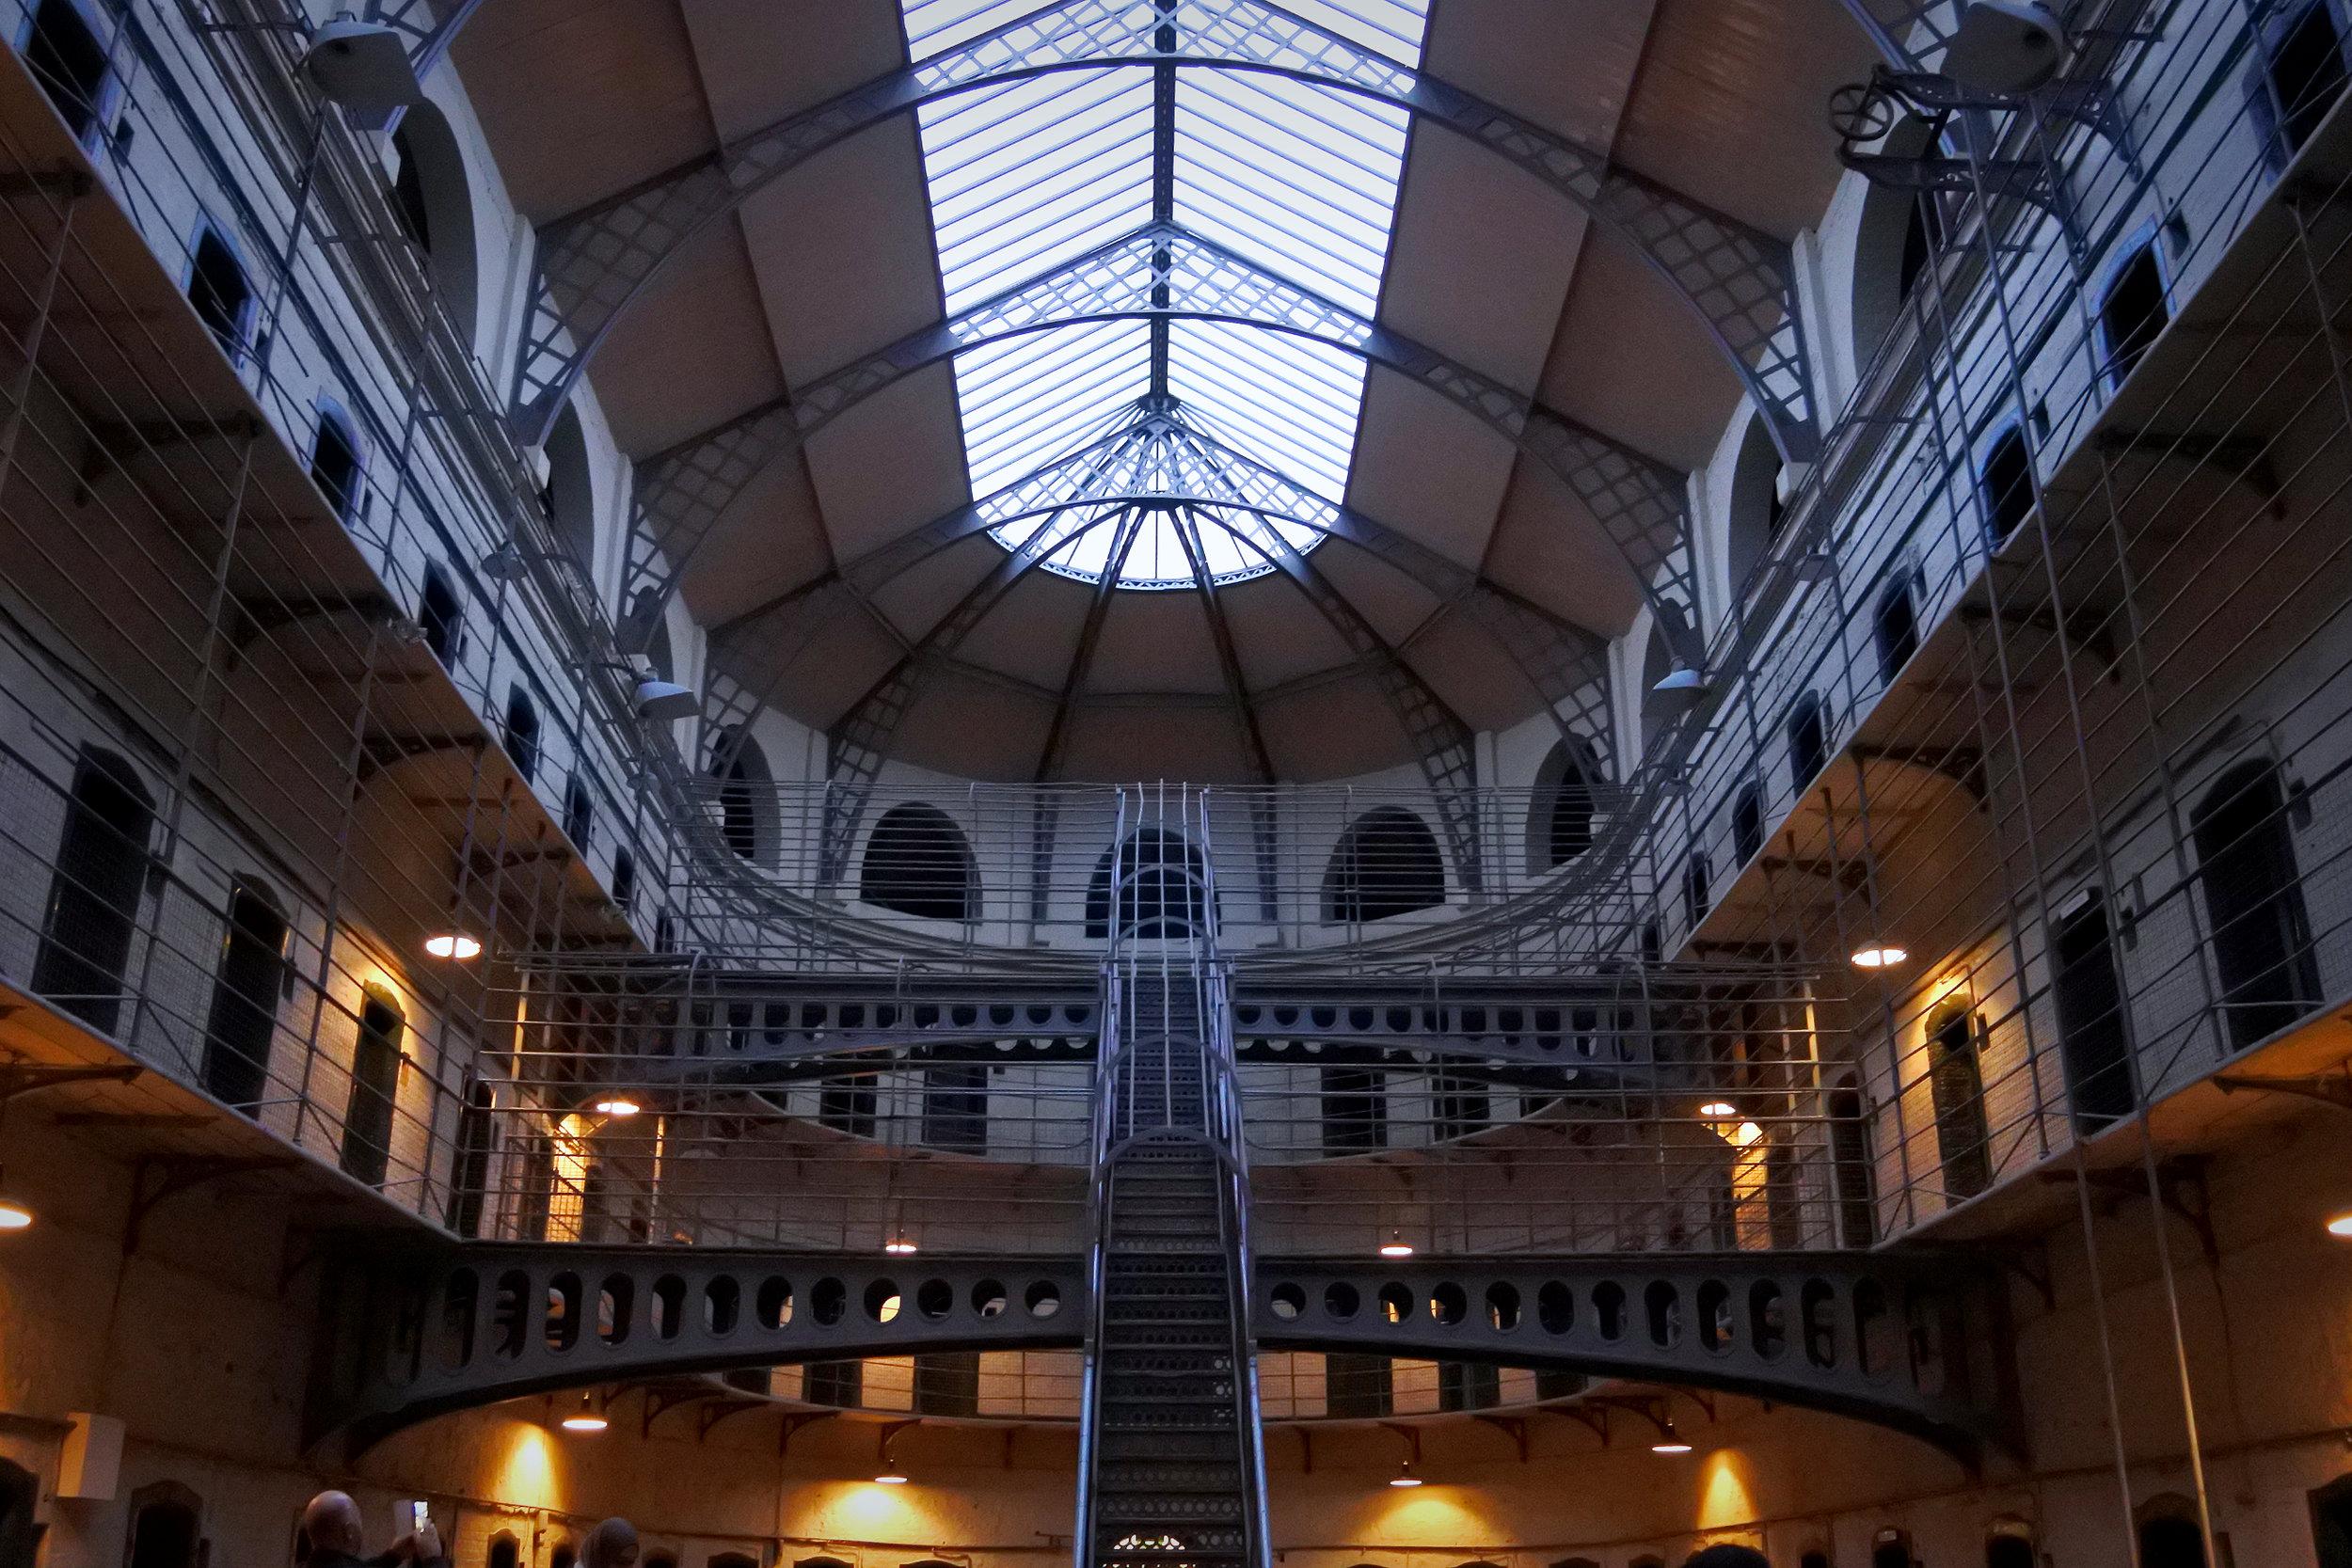 Interior of Kilmainham Gaol.